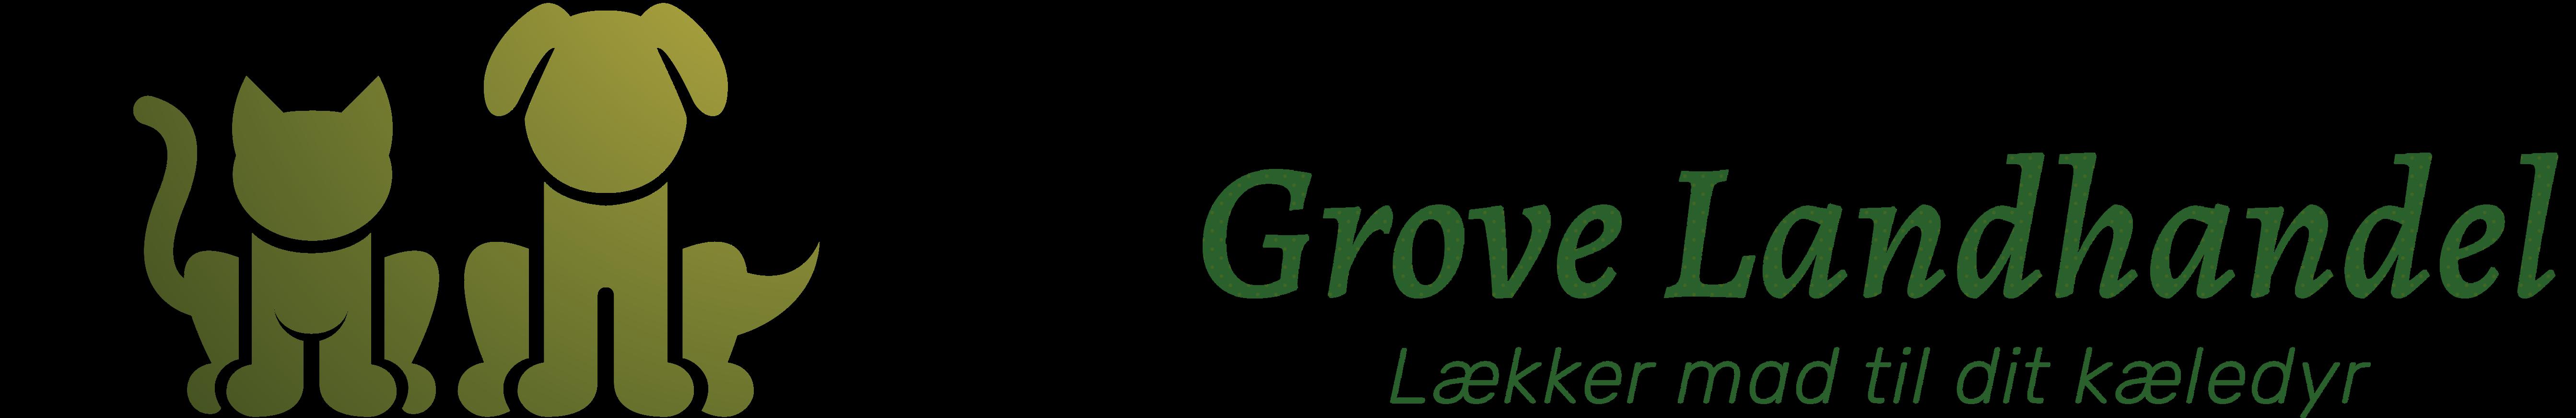 Grove Landhandel